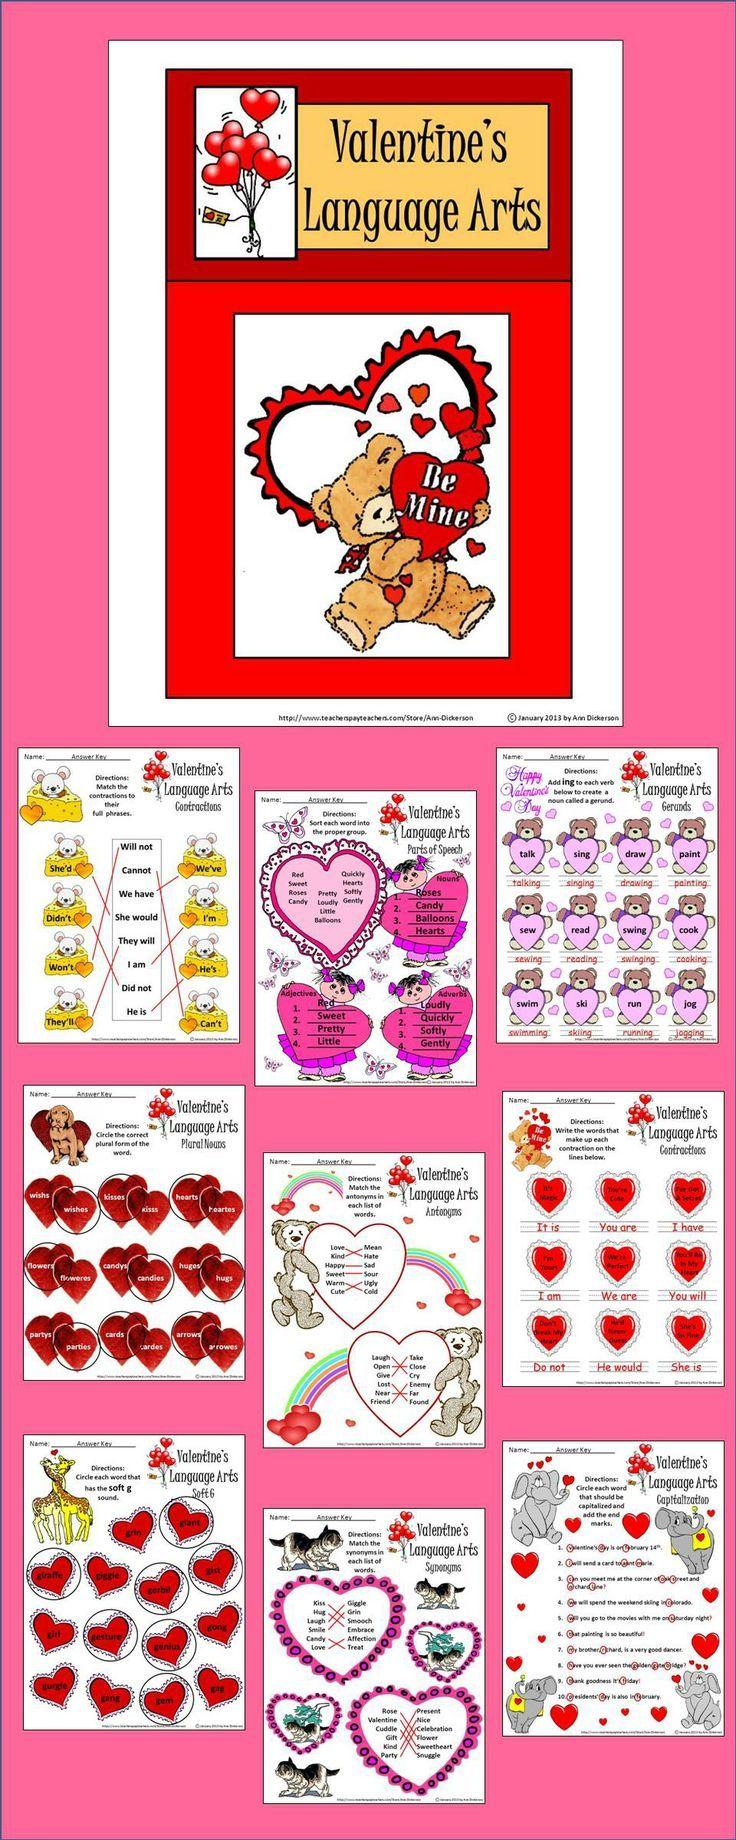 valentine 39 s day worksheets valentine 39 s language arts activity packet bw valentine tpt best. Black Bedroom Furniture Sets. Home Design Ideas